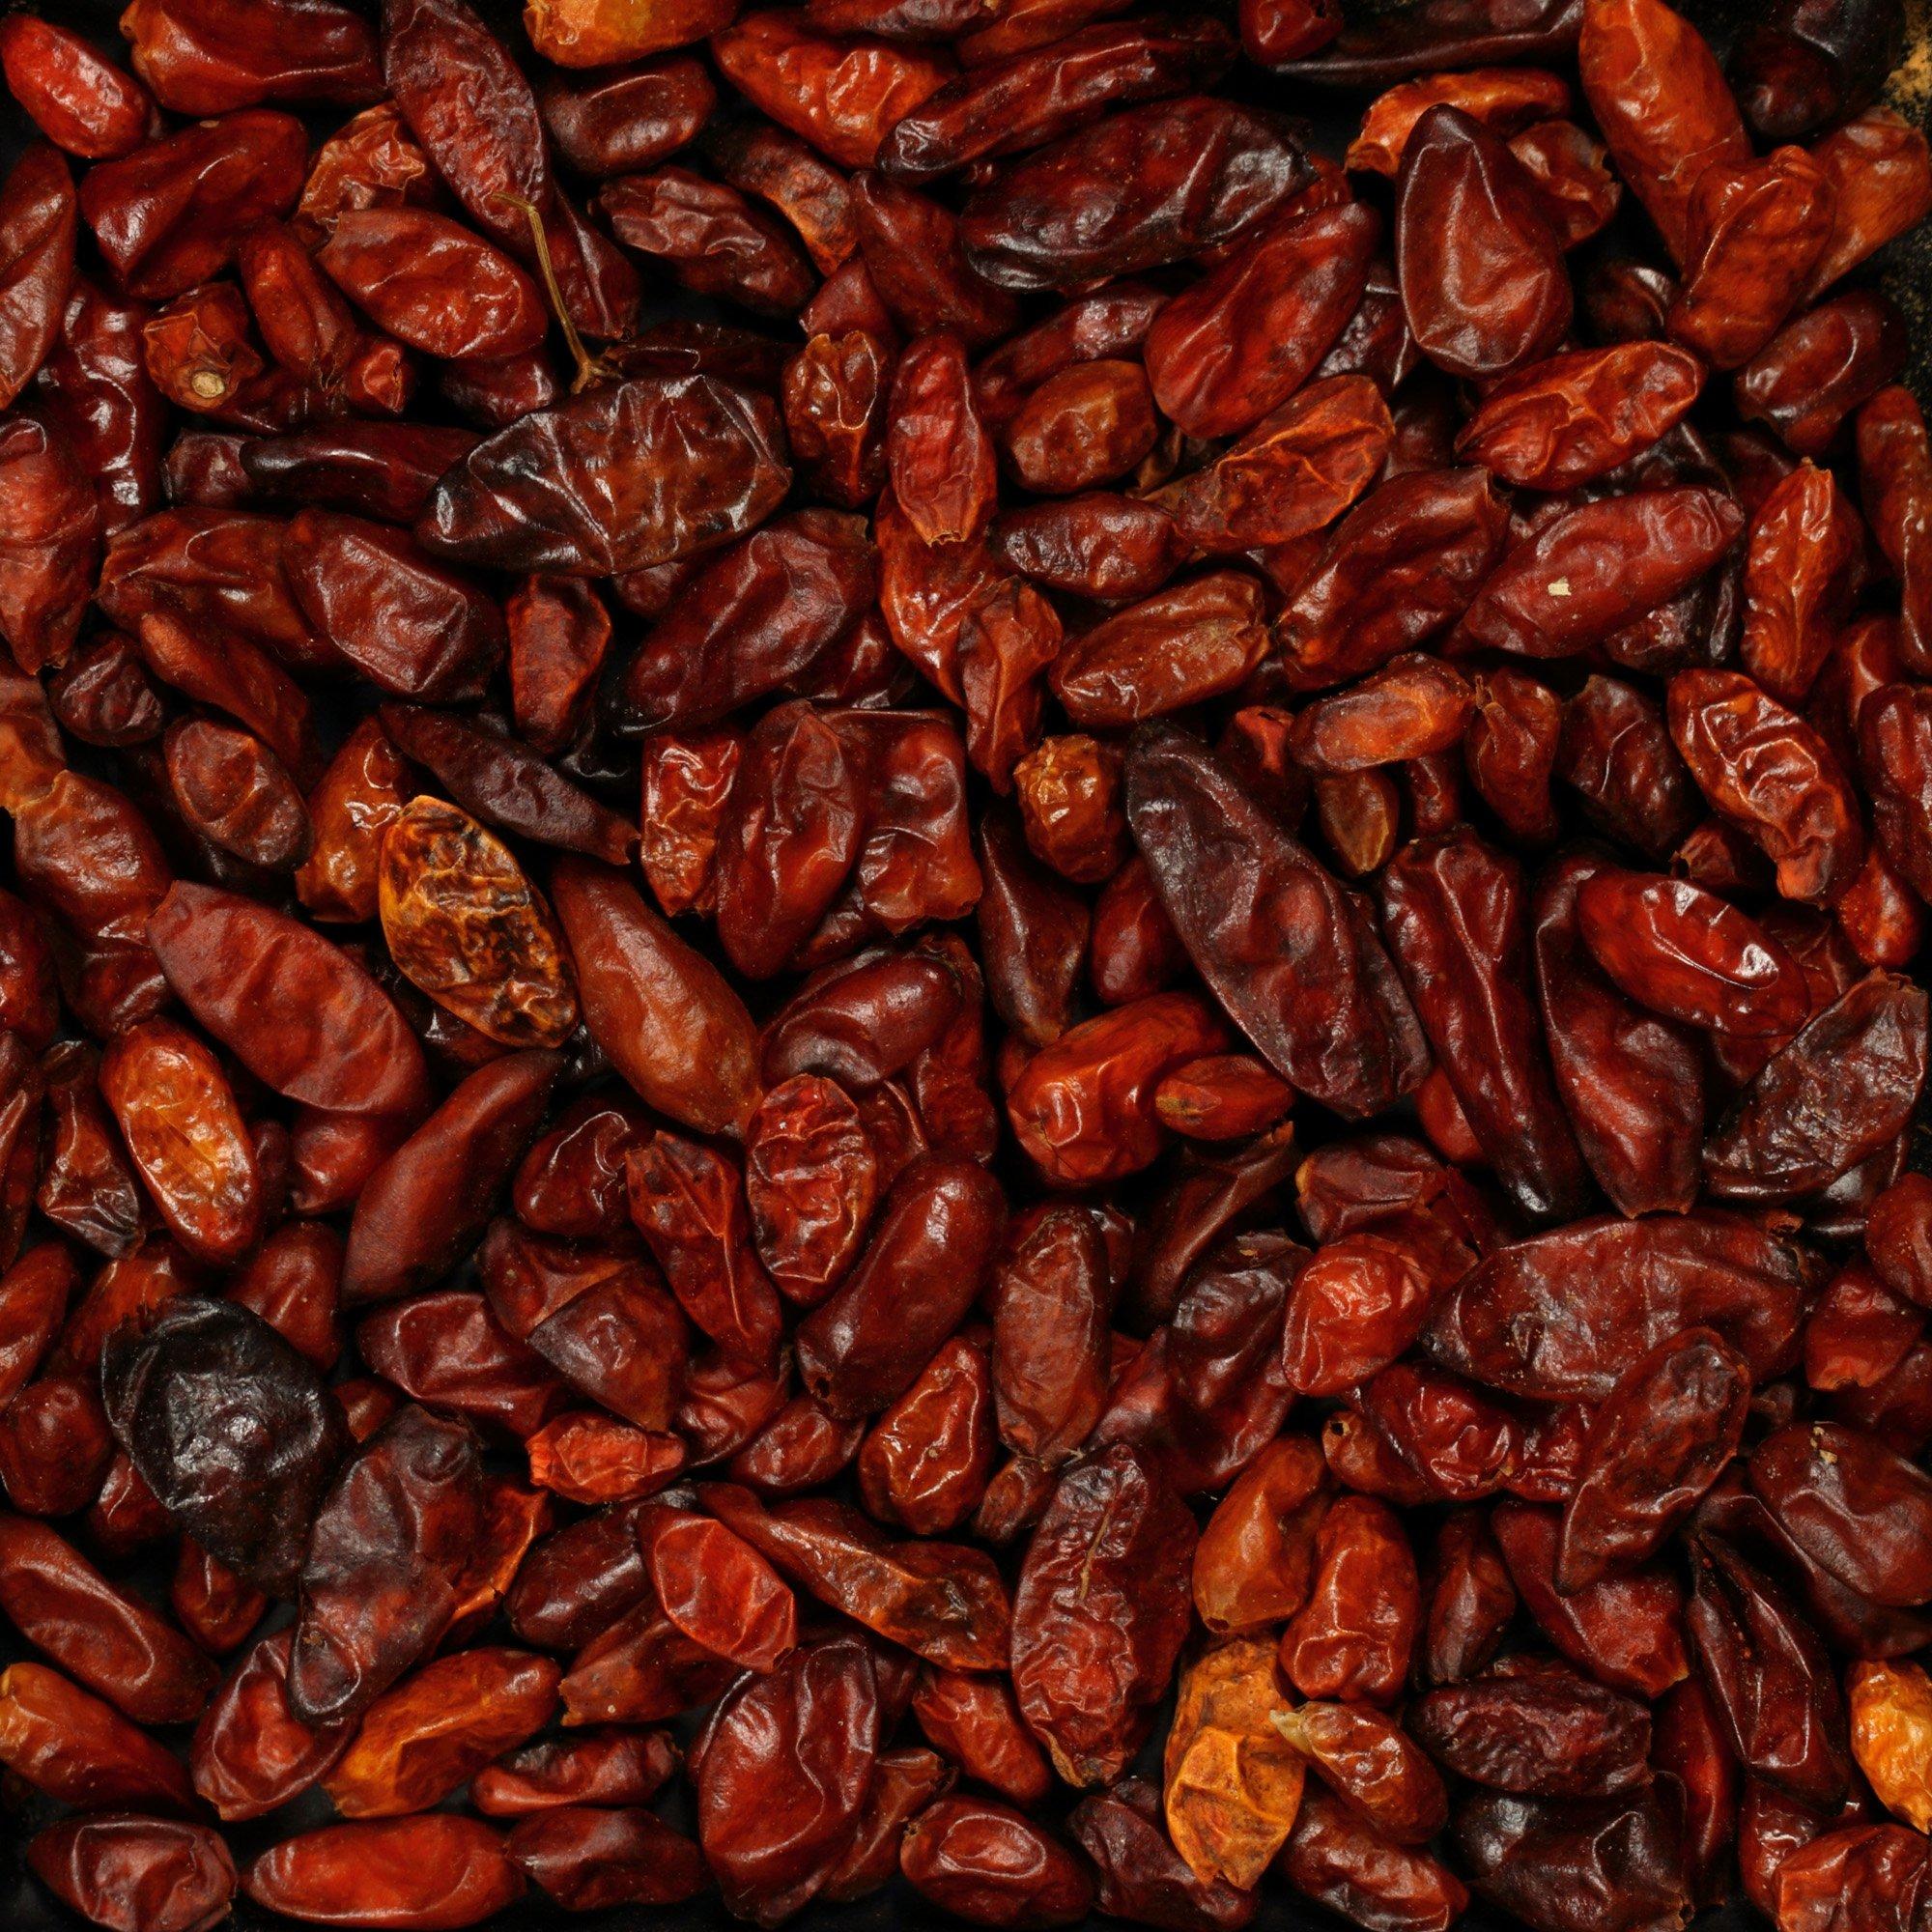 The Spice Lab No. 5161 - Wild Picked De-Stemmed Pequin Chiles - Kosher Gluten-Free Non-GMO All Natural Spice - 4 oz Resealable Bag